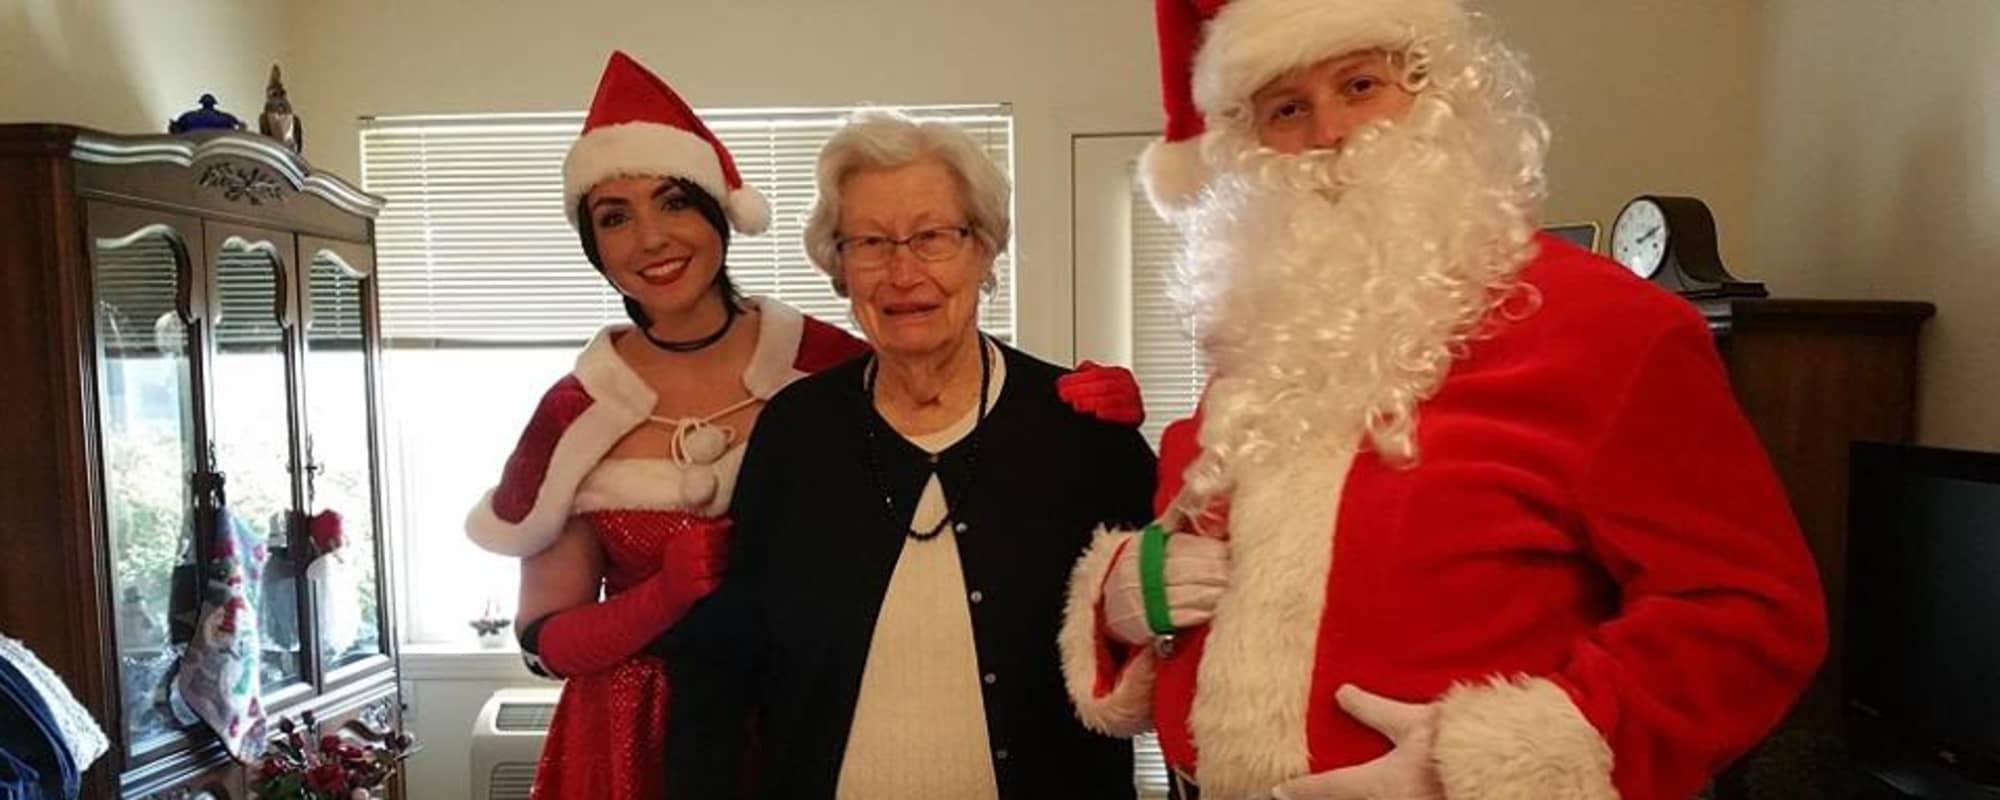 Senior with Santa The Commons on Thornton in Stockton, California